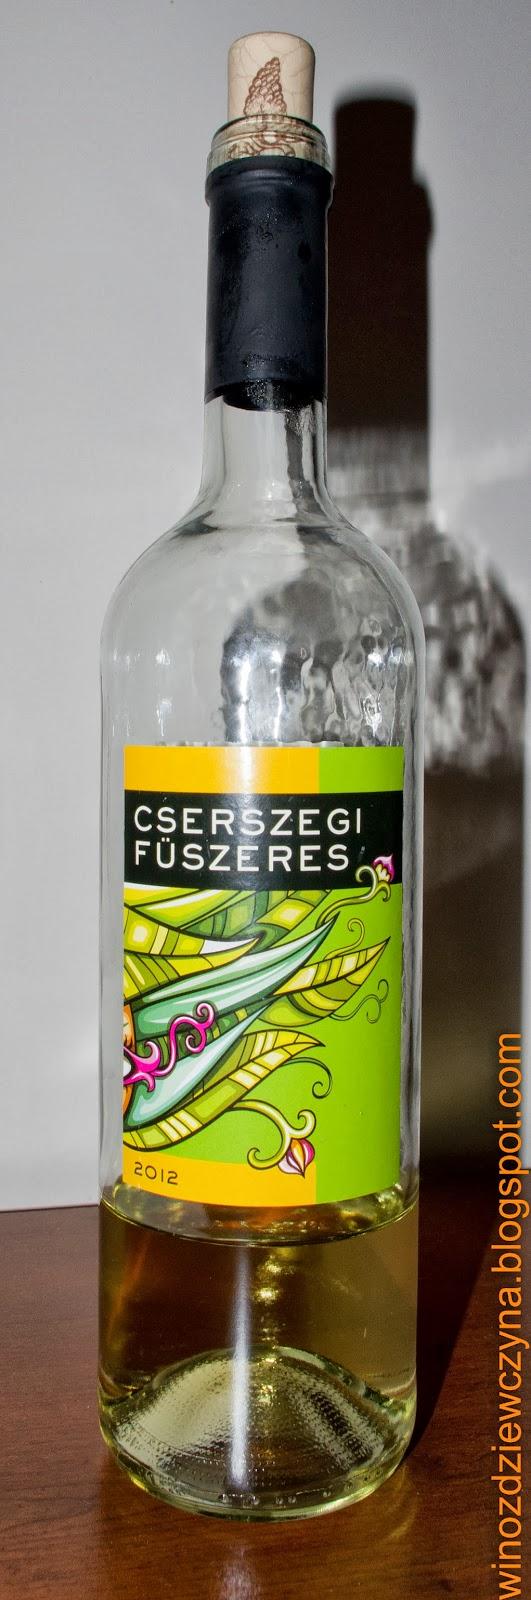 Węgry wino białe